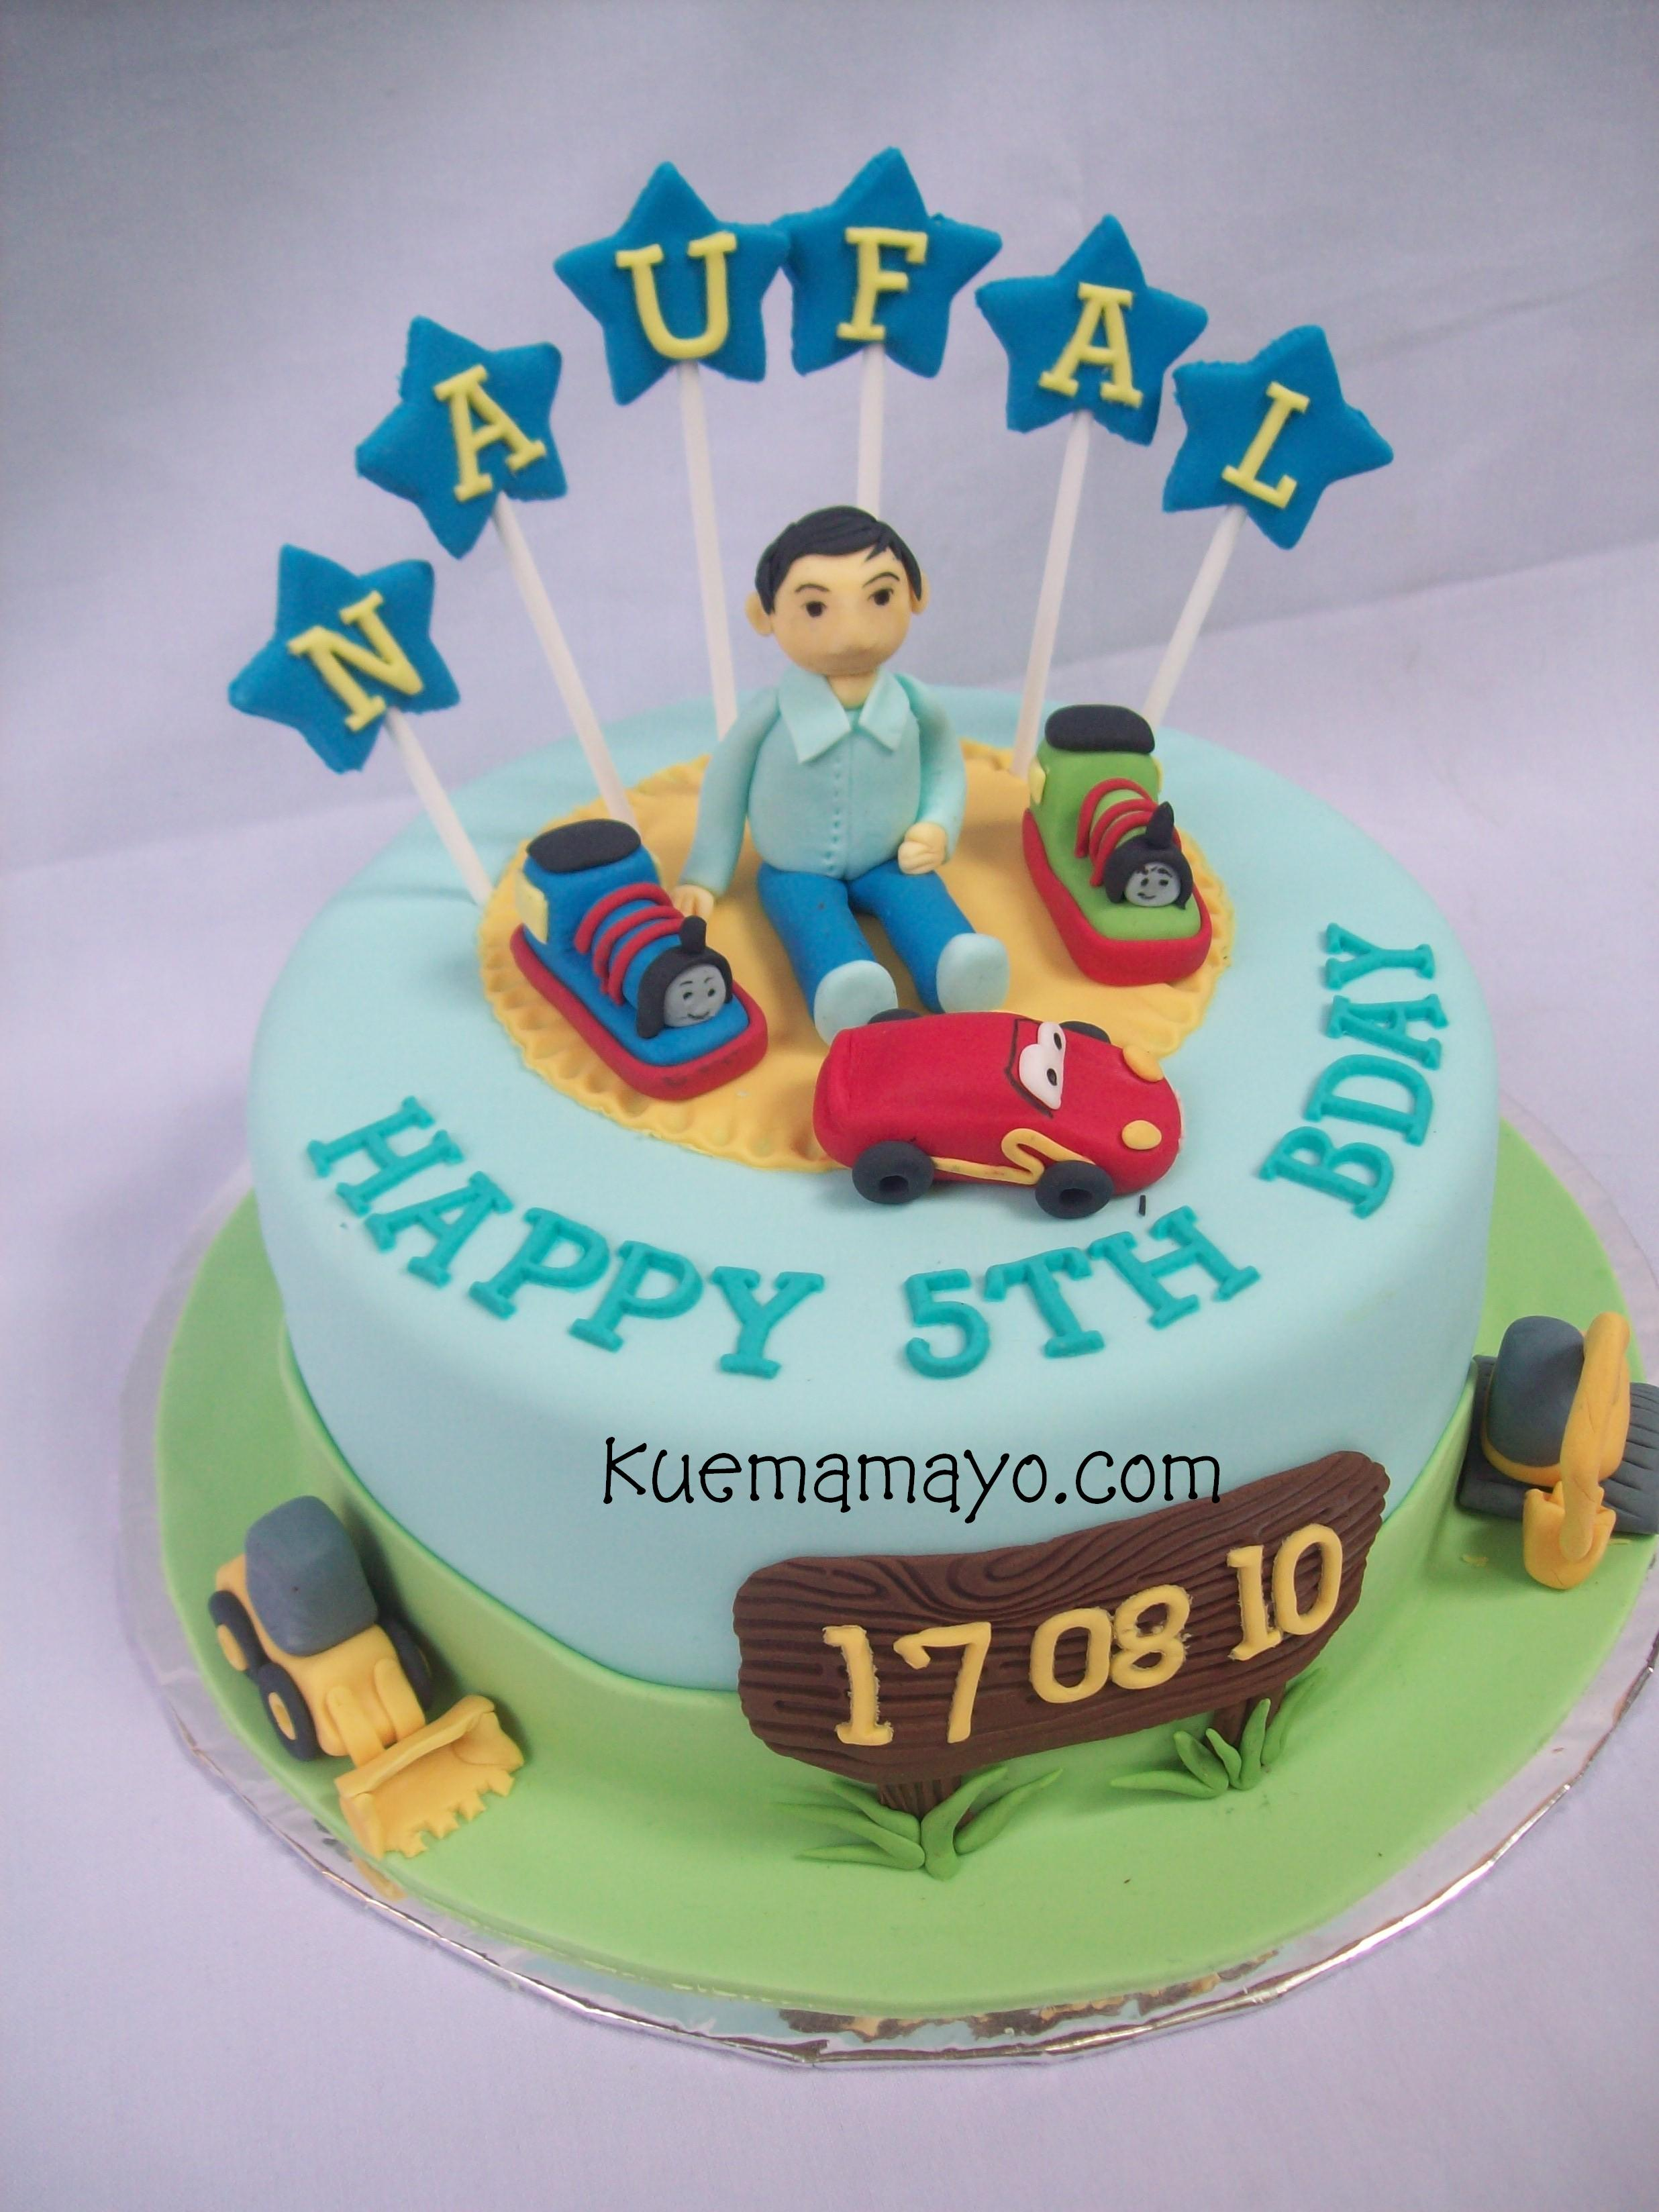 Gambar Kue Ultah Lucu Untuk Anak Medsos Kini